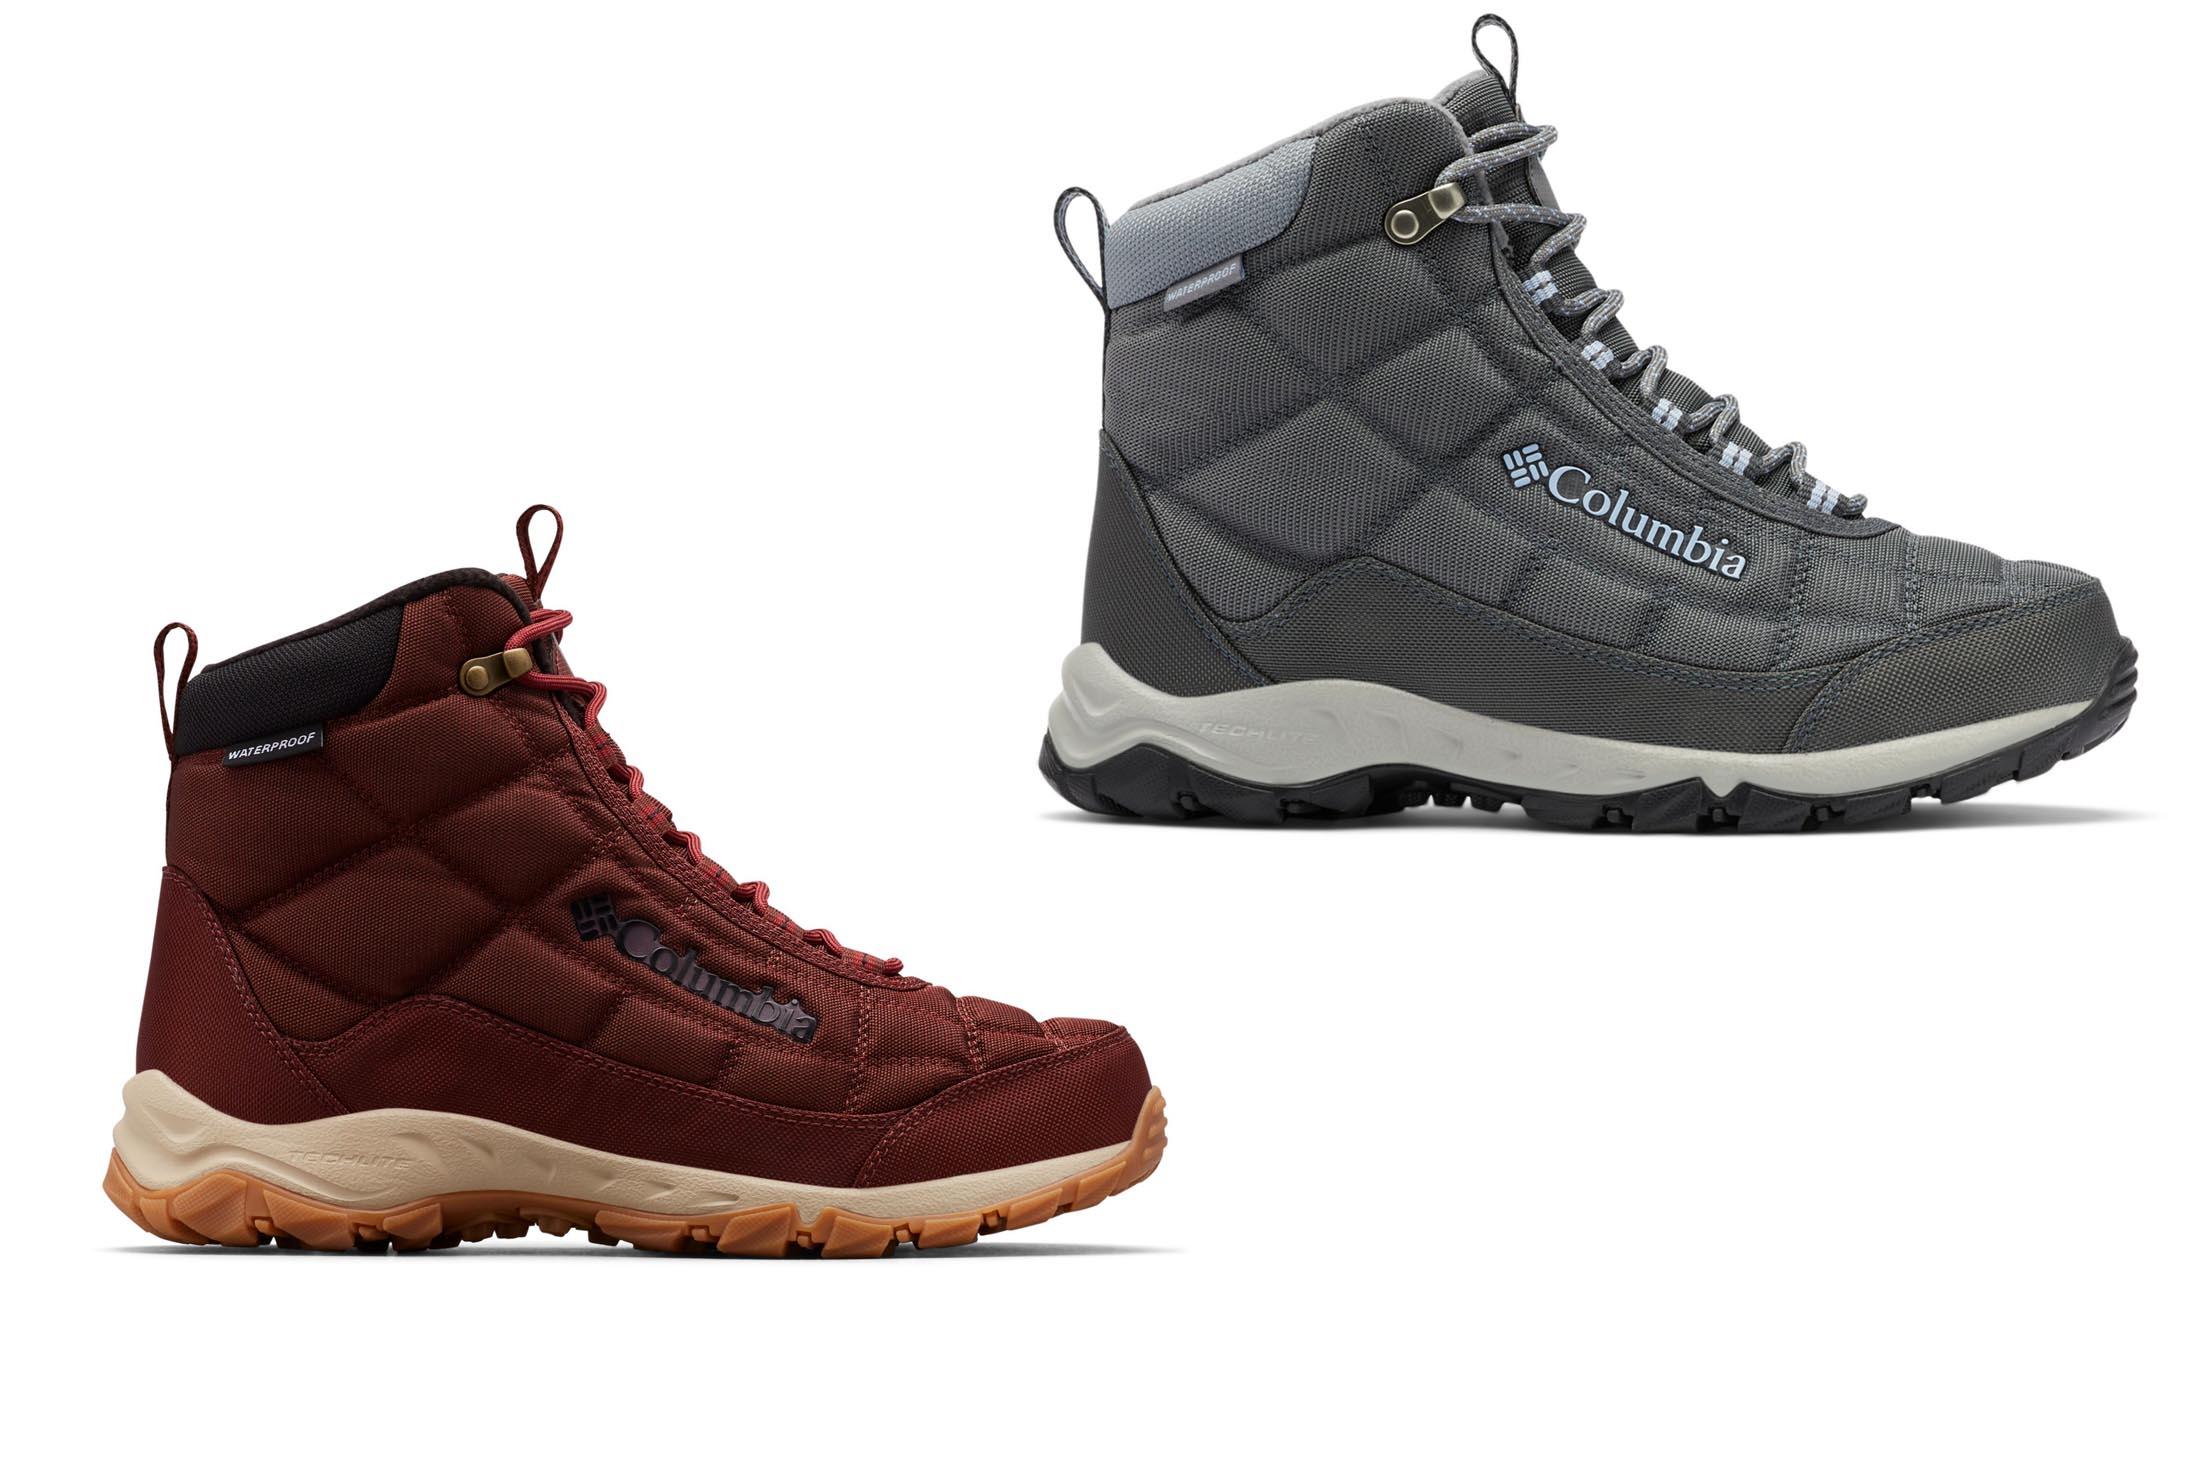 firecamp boots